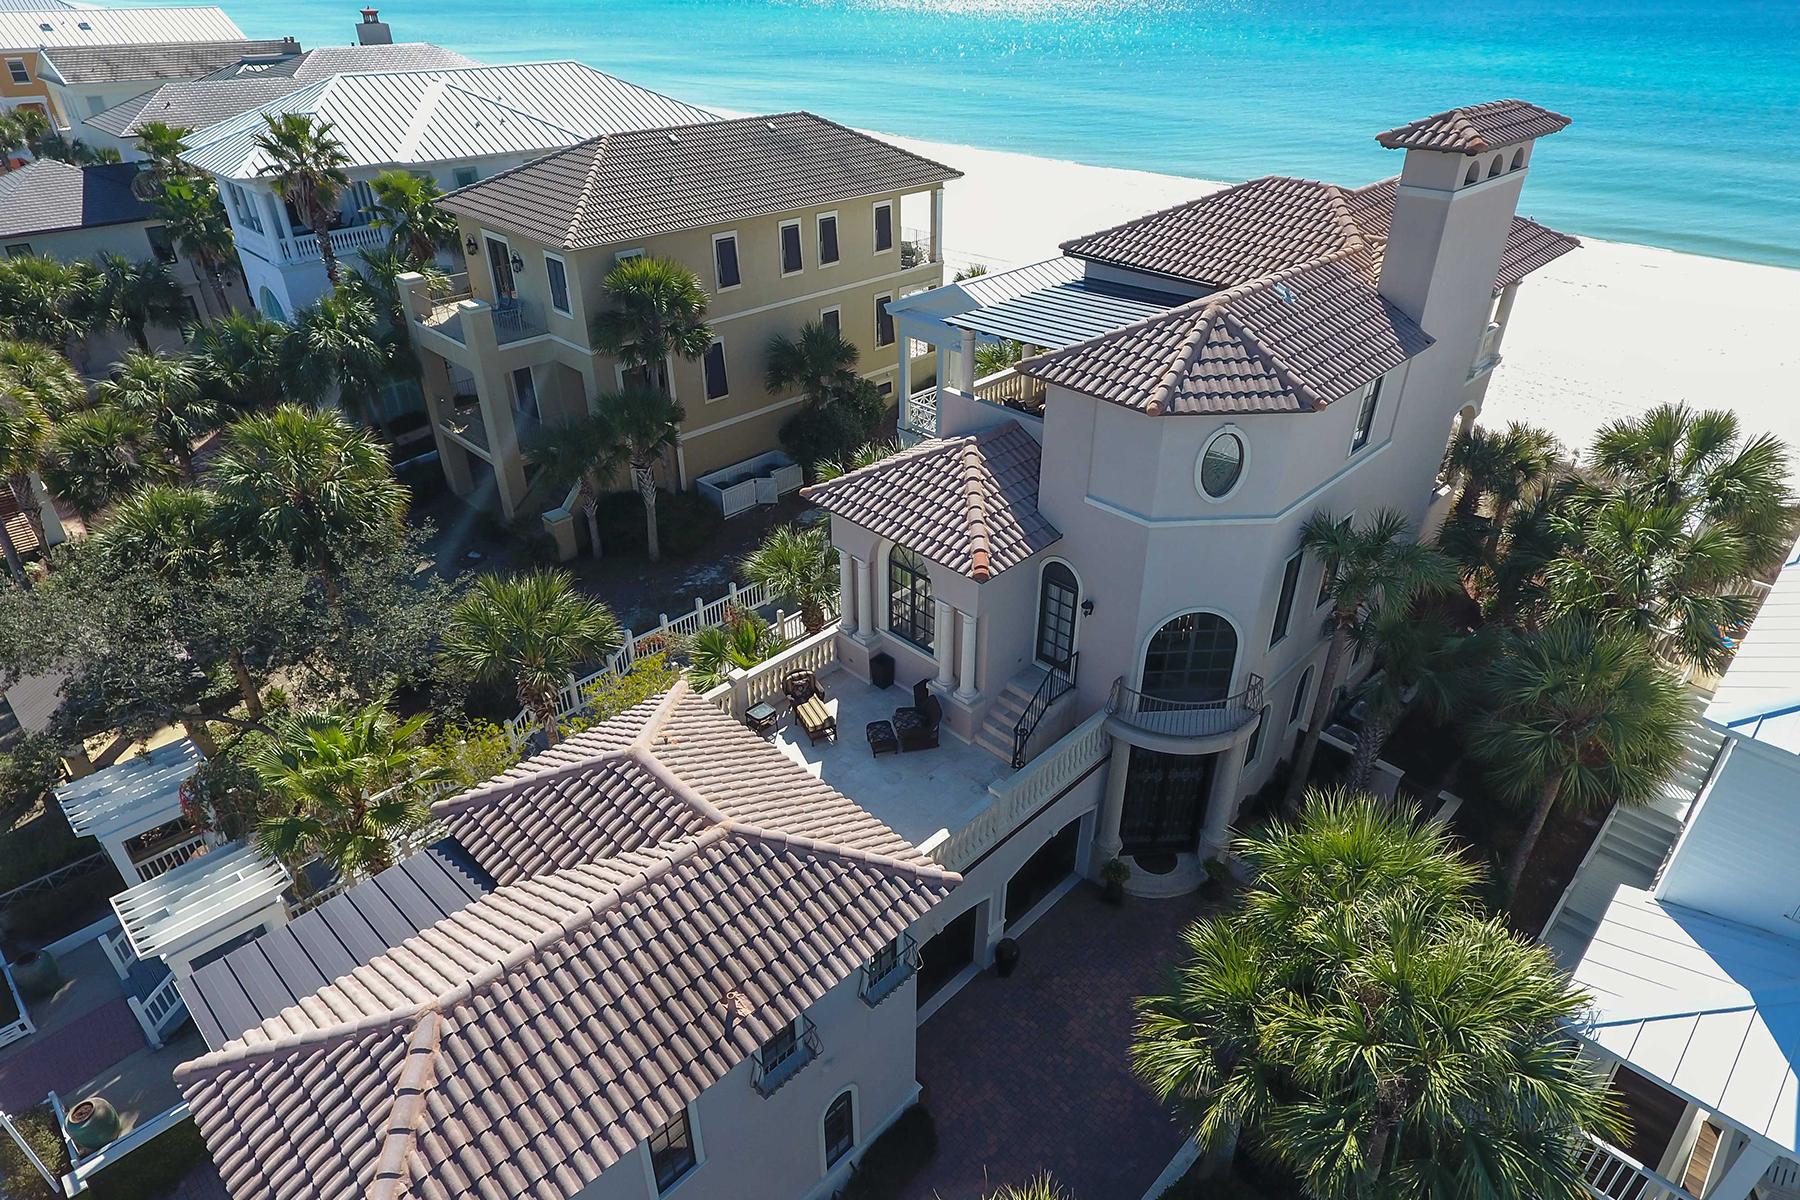 Casa para uma família para Venda às OCEANFRONT LUXURY WITH MEDITERRANEAN CLASS AND STYLE 314 Beachside Drive Carillon Beach, Panama City Beach, Florida, 32413 Estados Unidos